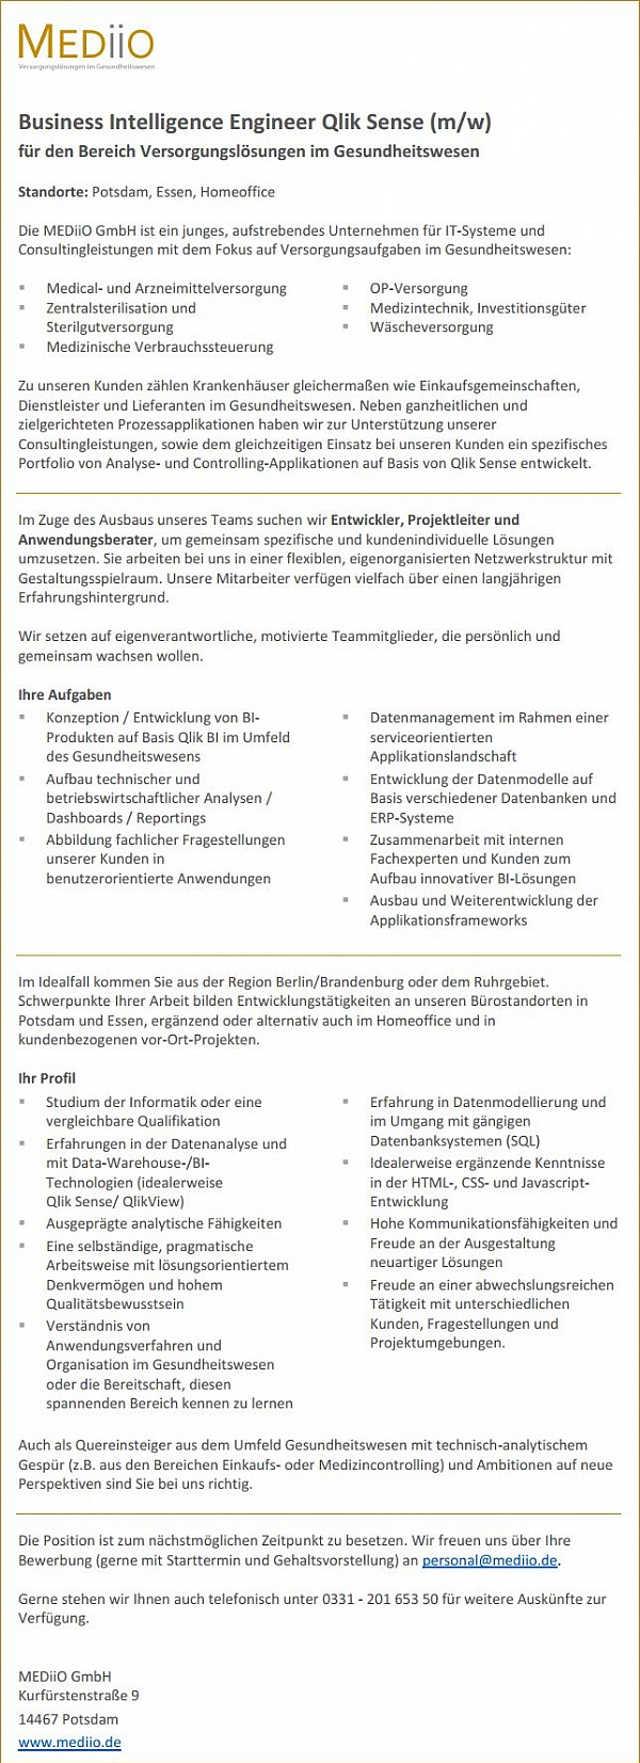 MEDiiO GmbH, Potsdam: Business Intelligence Engineer Qlik Sense (m/w)